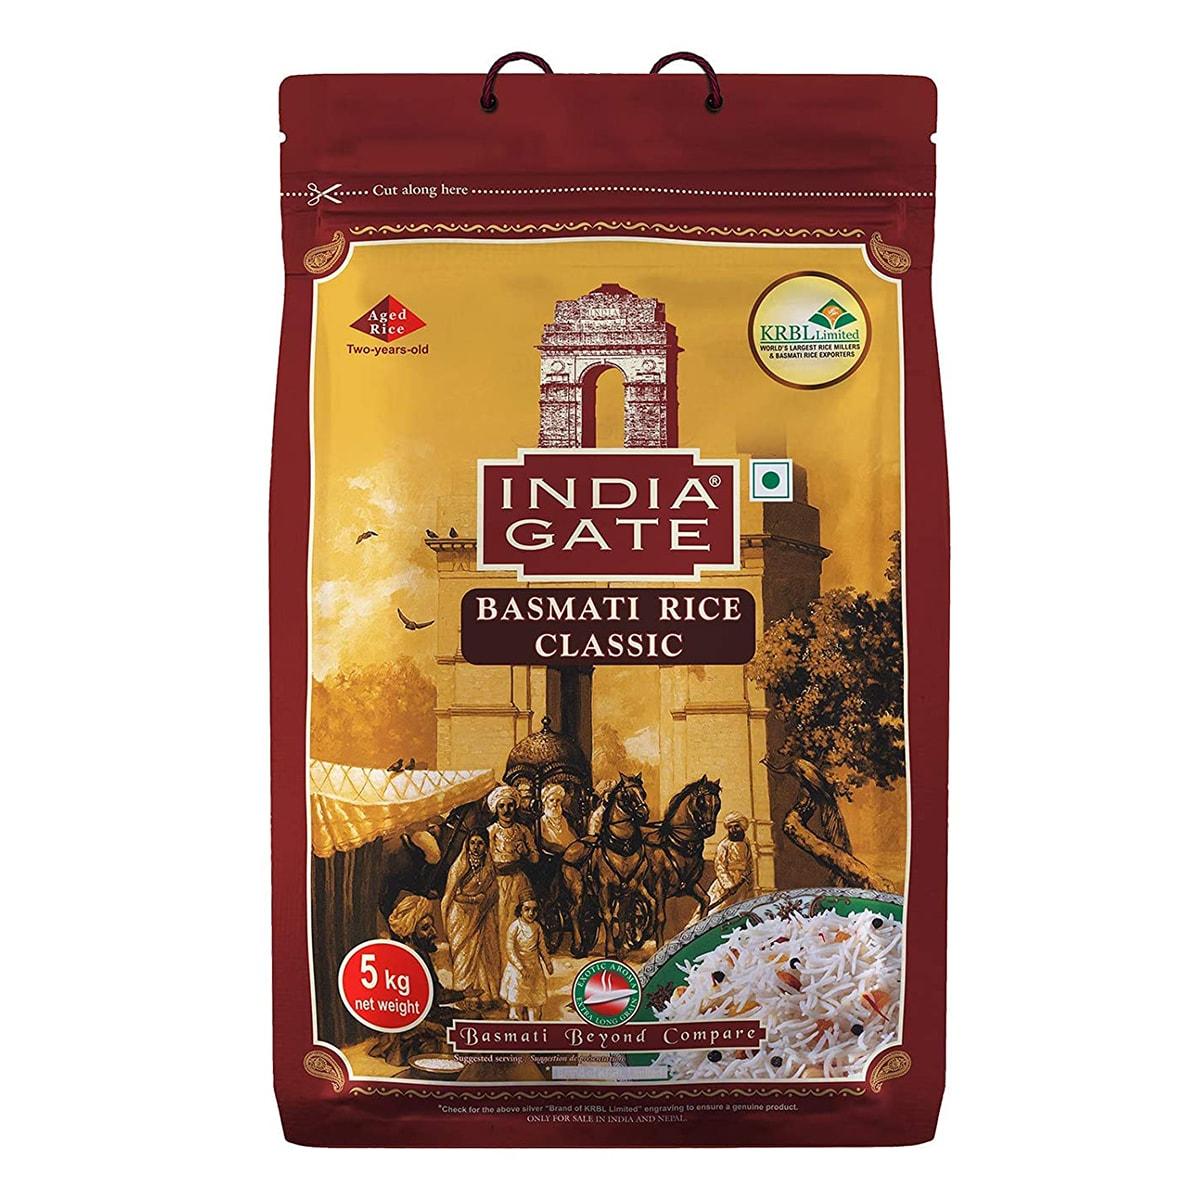 Buy India Gate Basmati Rice Classic - 5 kg